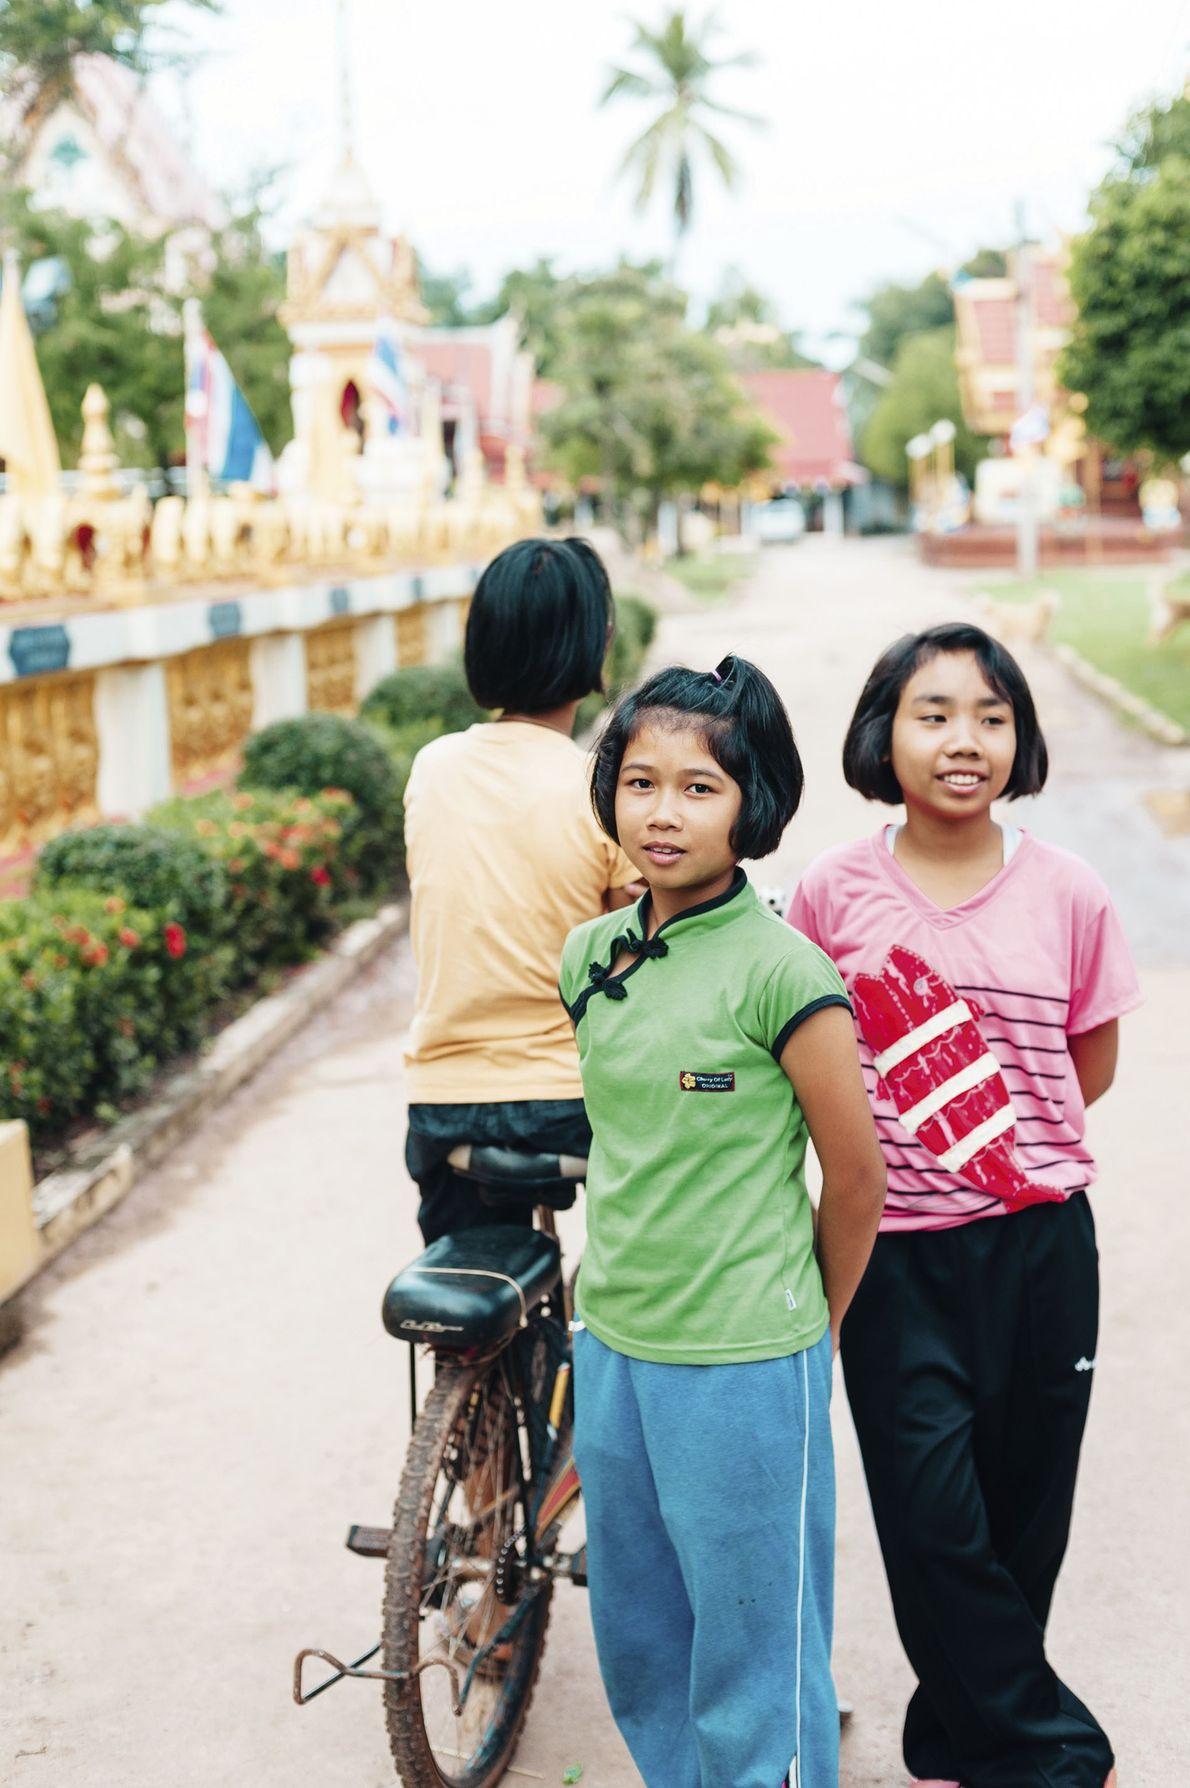 Three local girls